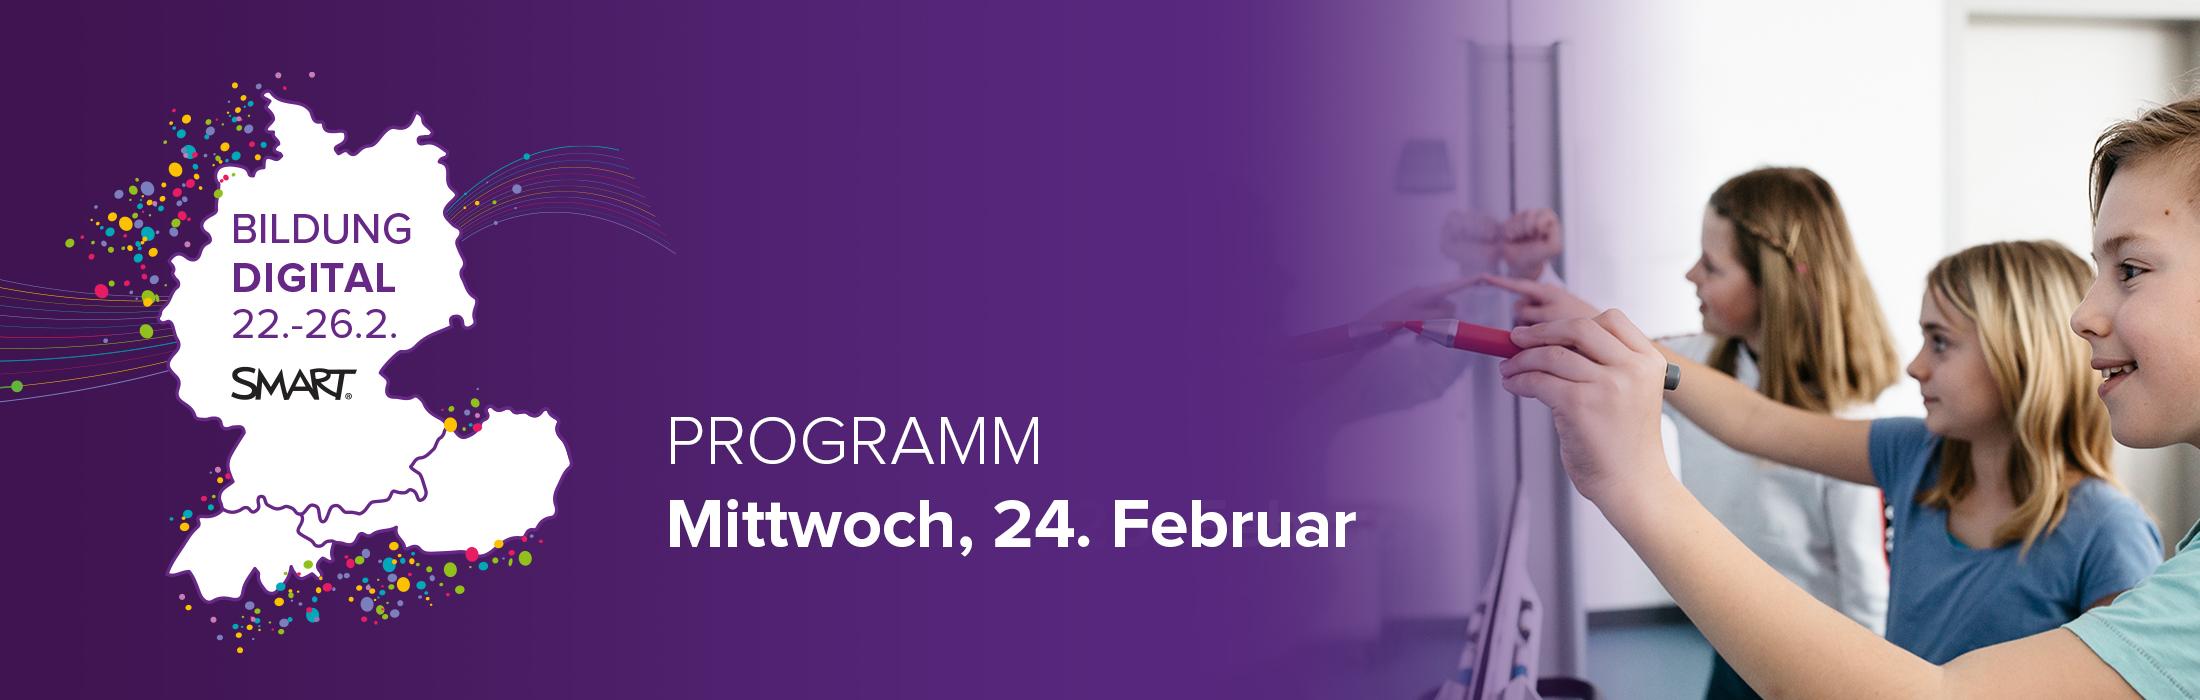 DACH-BD_Header-Programm-Mi_VS2